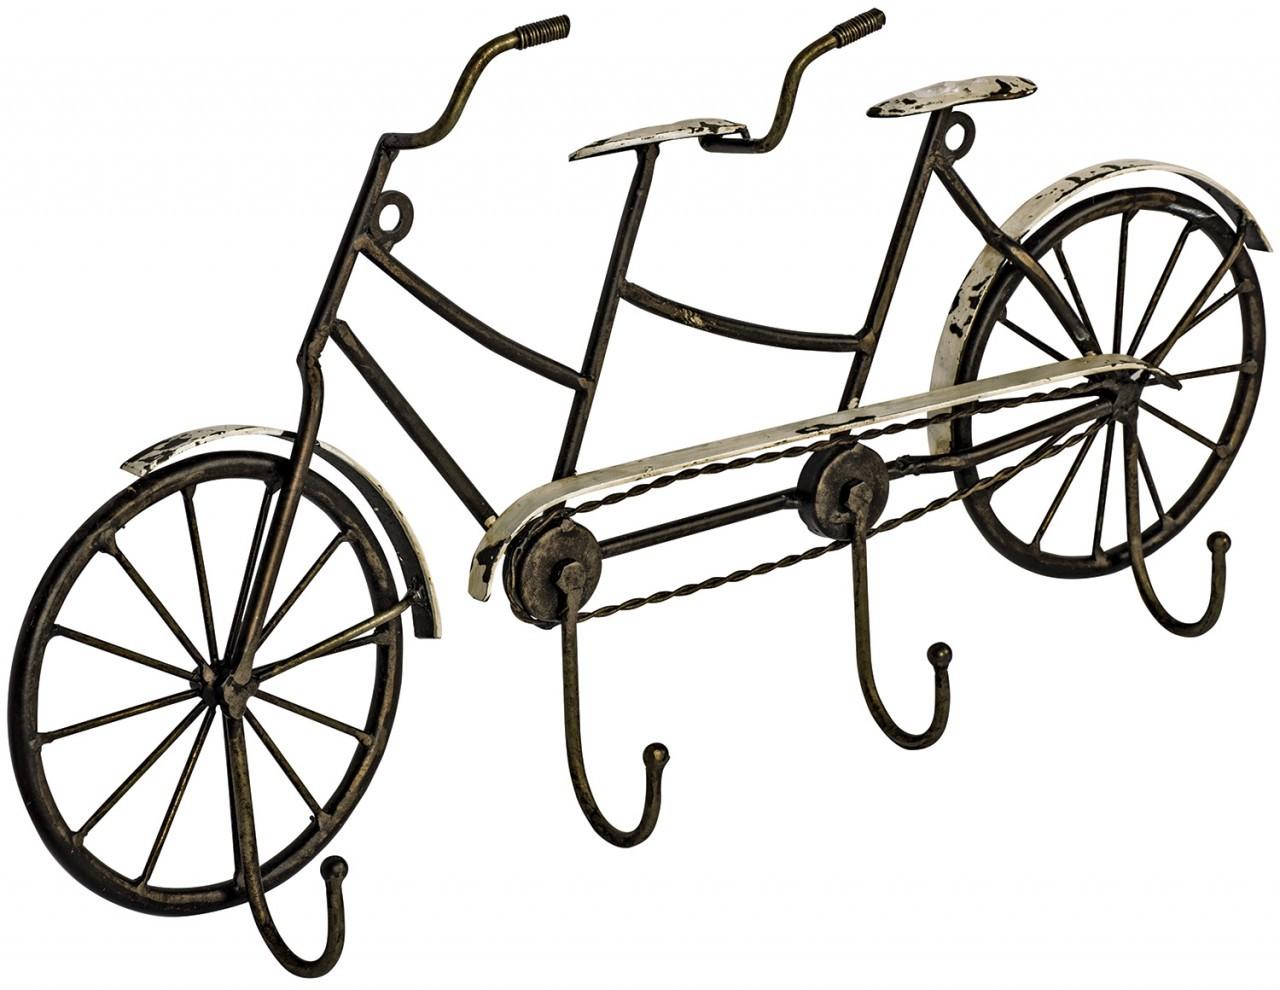 1280x990 Bicycle Wall Art Tandem Bicycle